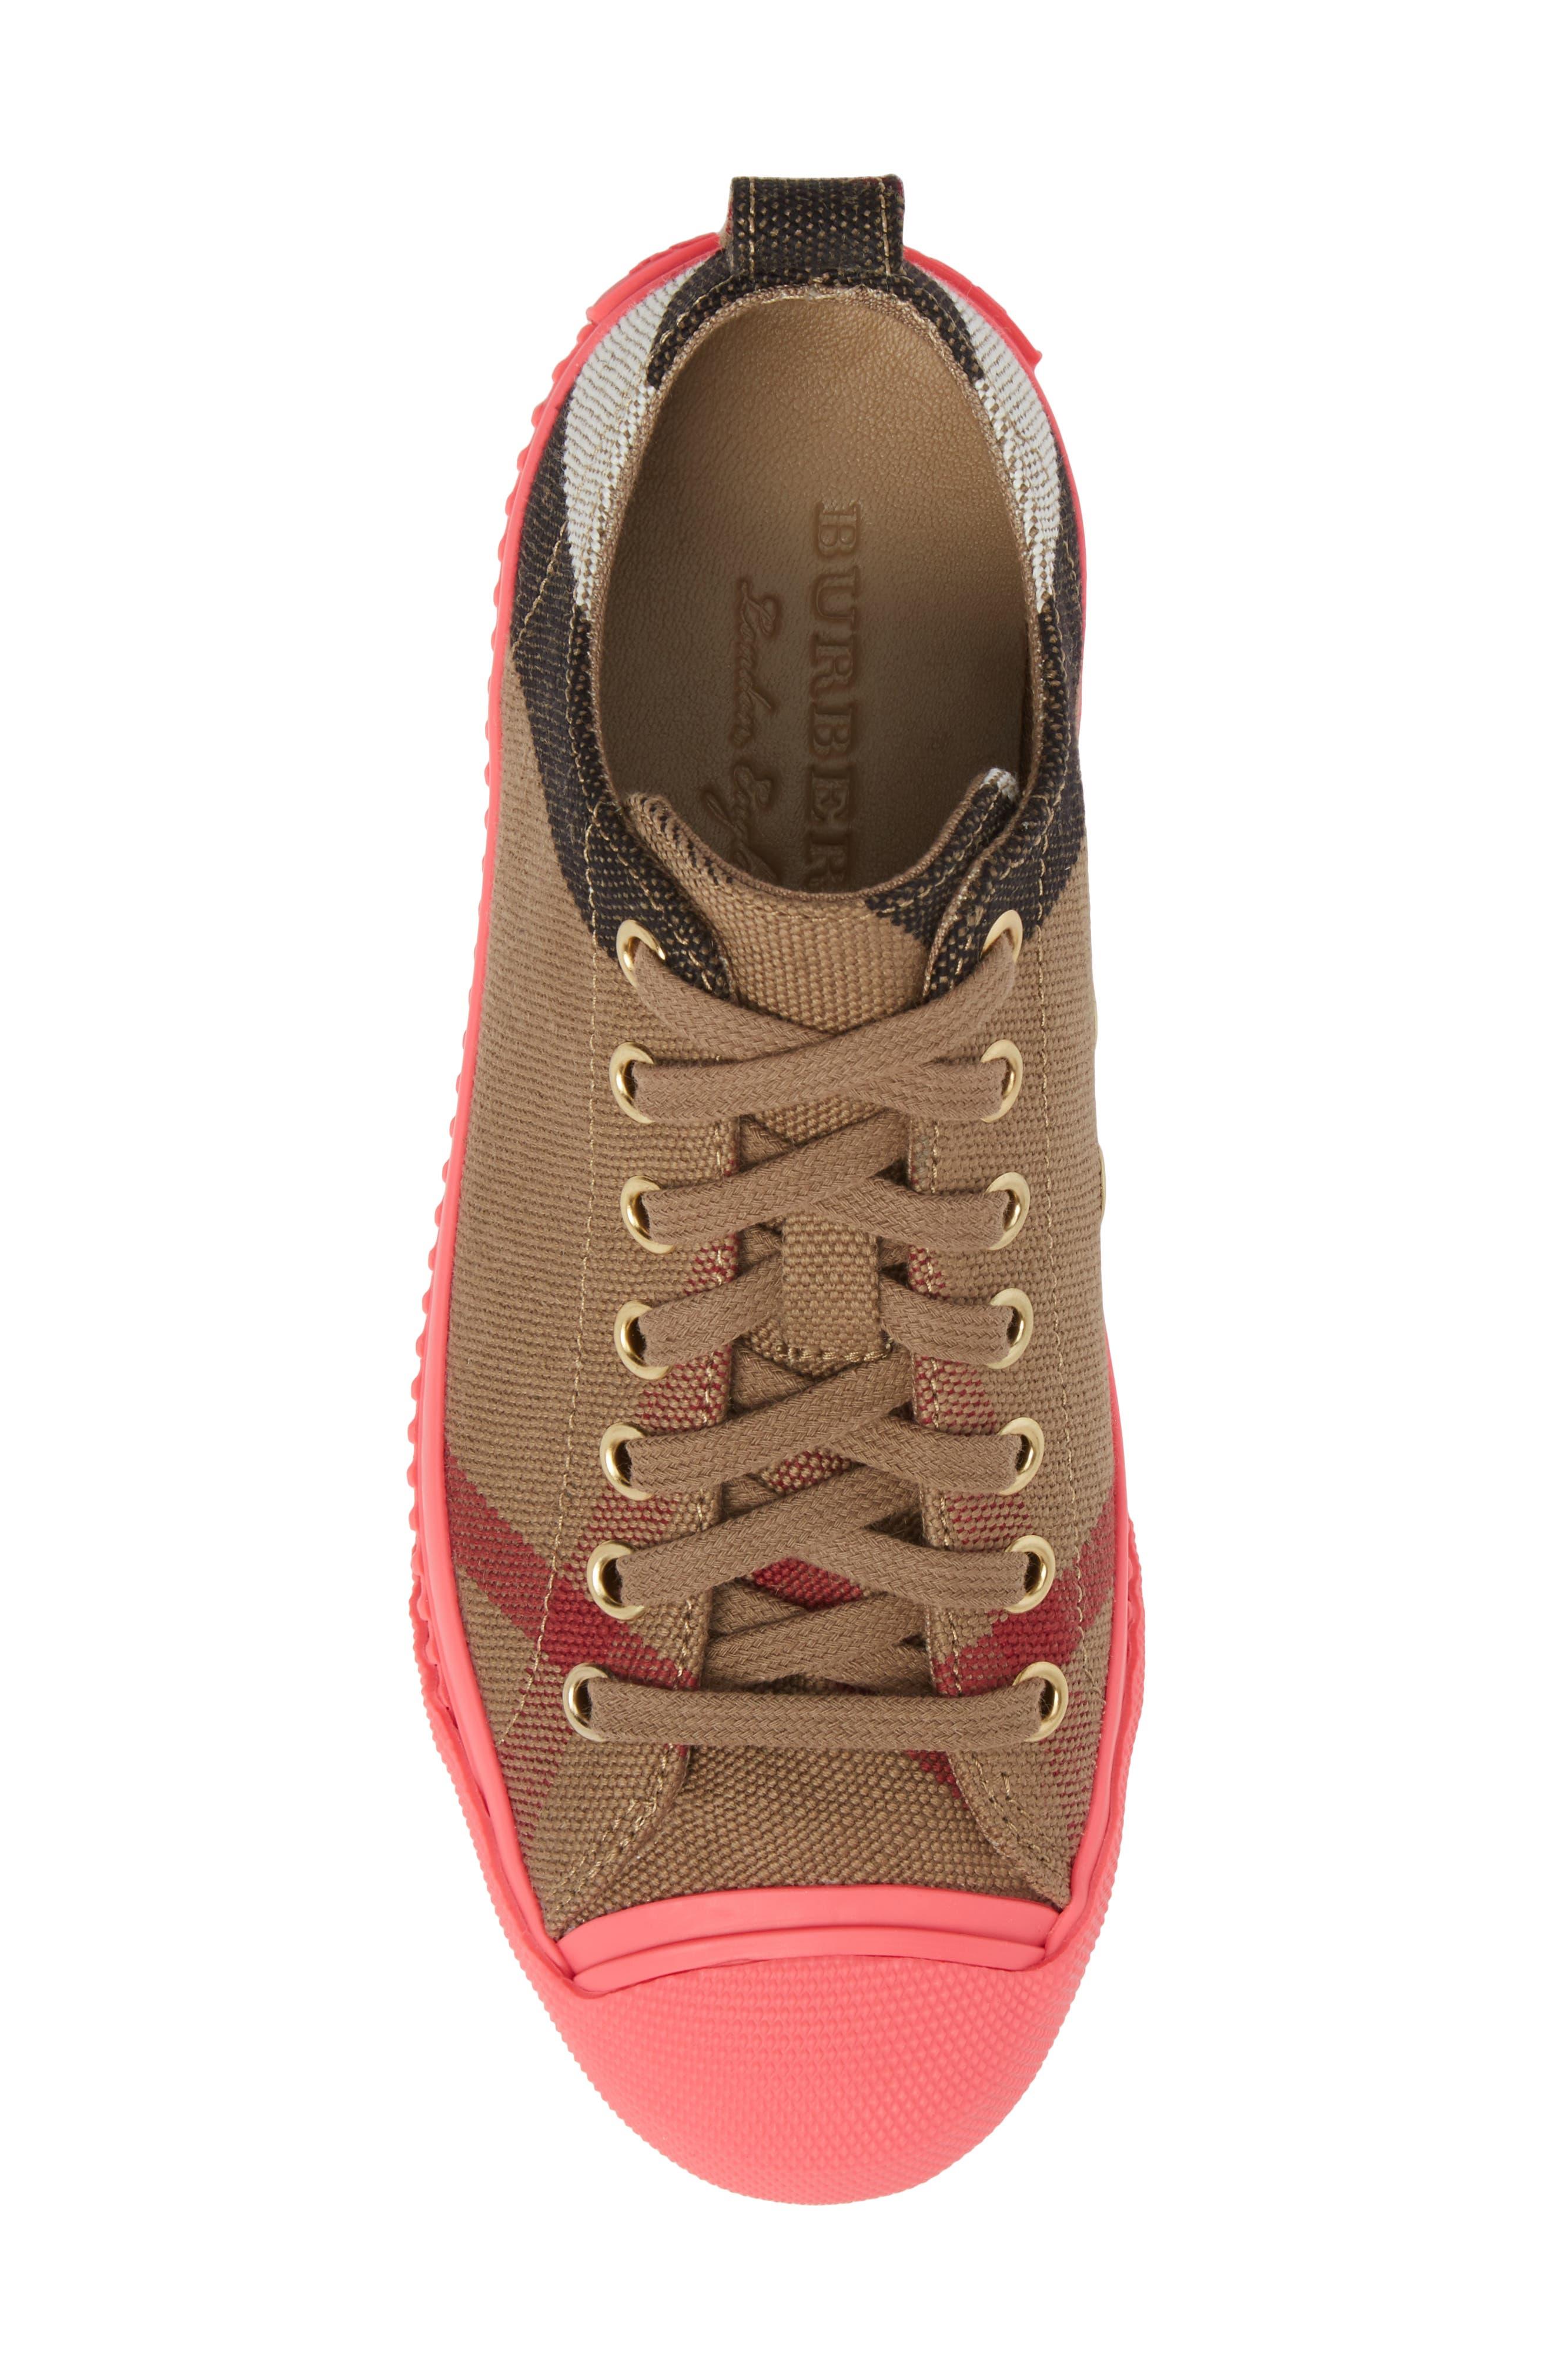 Bourne Sneaker,                             Alternate thumbnail 5, color,                             Classic Check